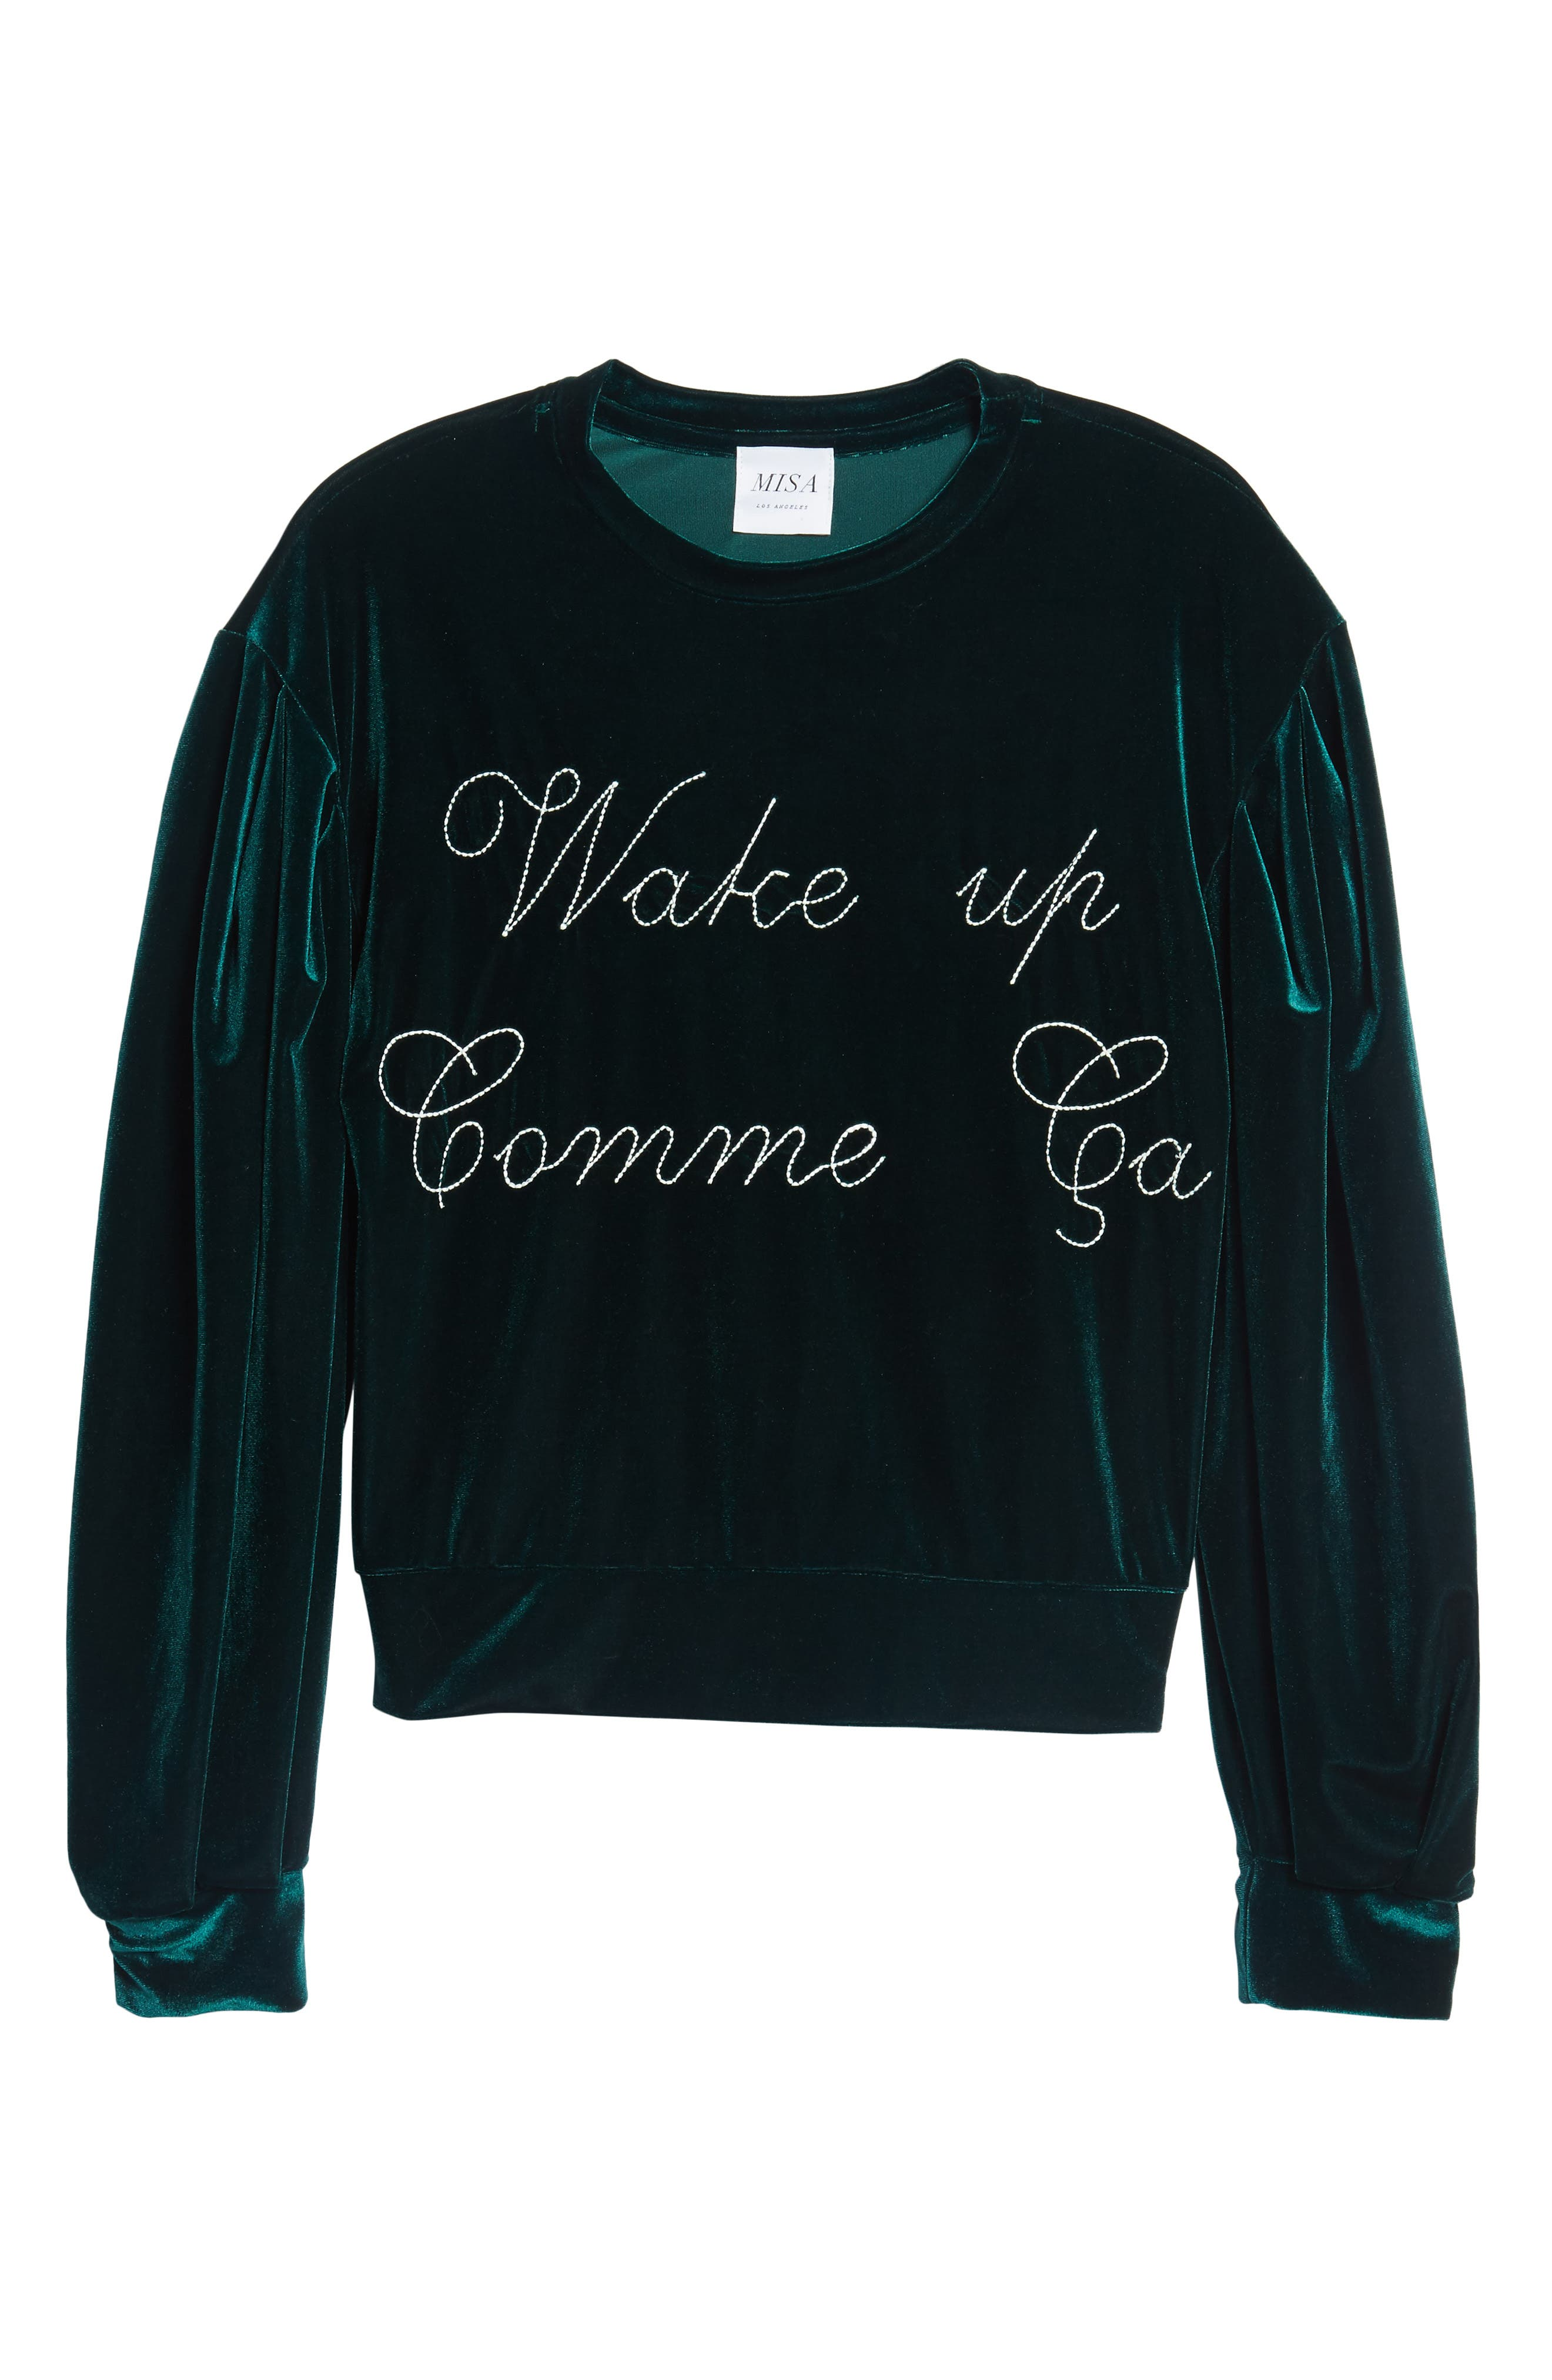 Comme Ca Velvet Sweatshirt,                             Alternate thumbnail 6, color,                             300